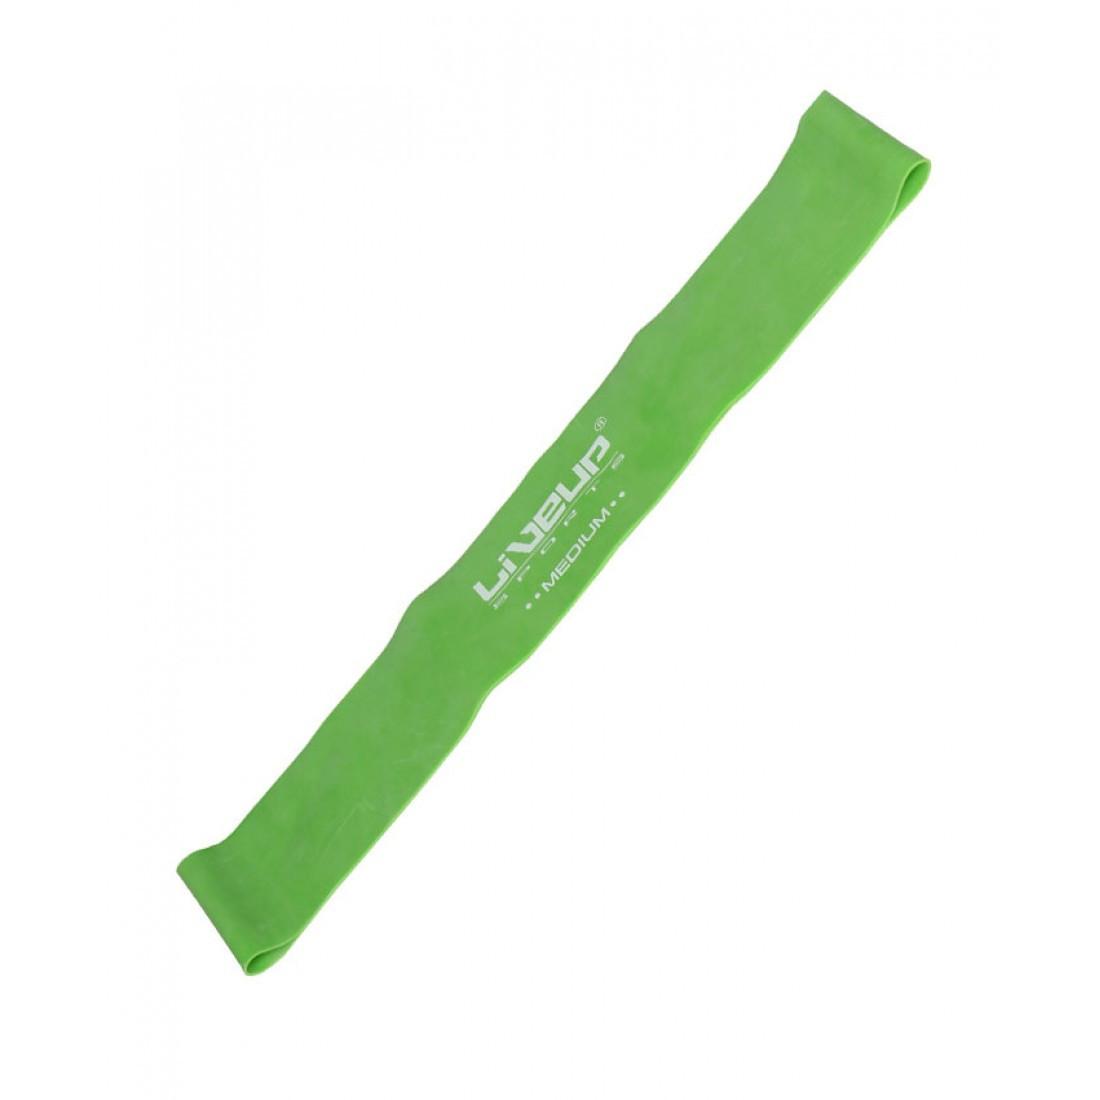 Эспандер-петля LiveUp Latex Loop, среднее сопротивление